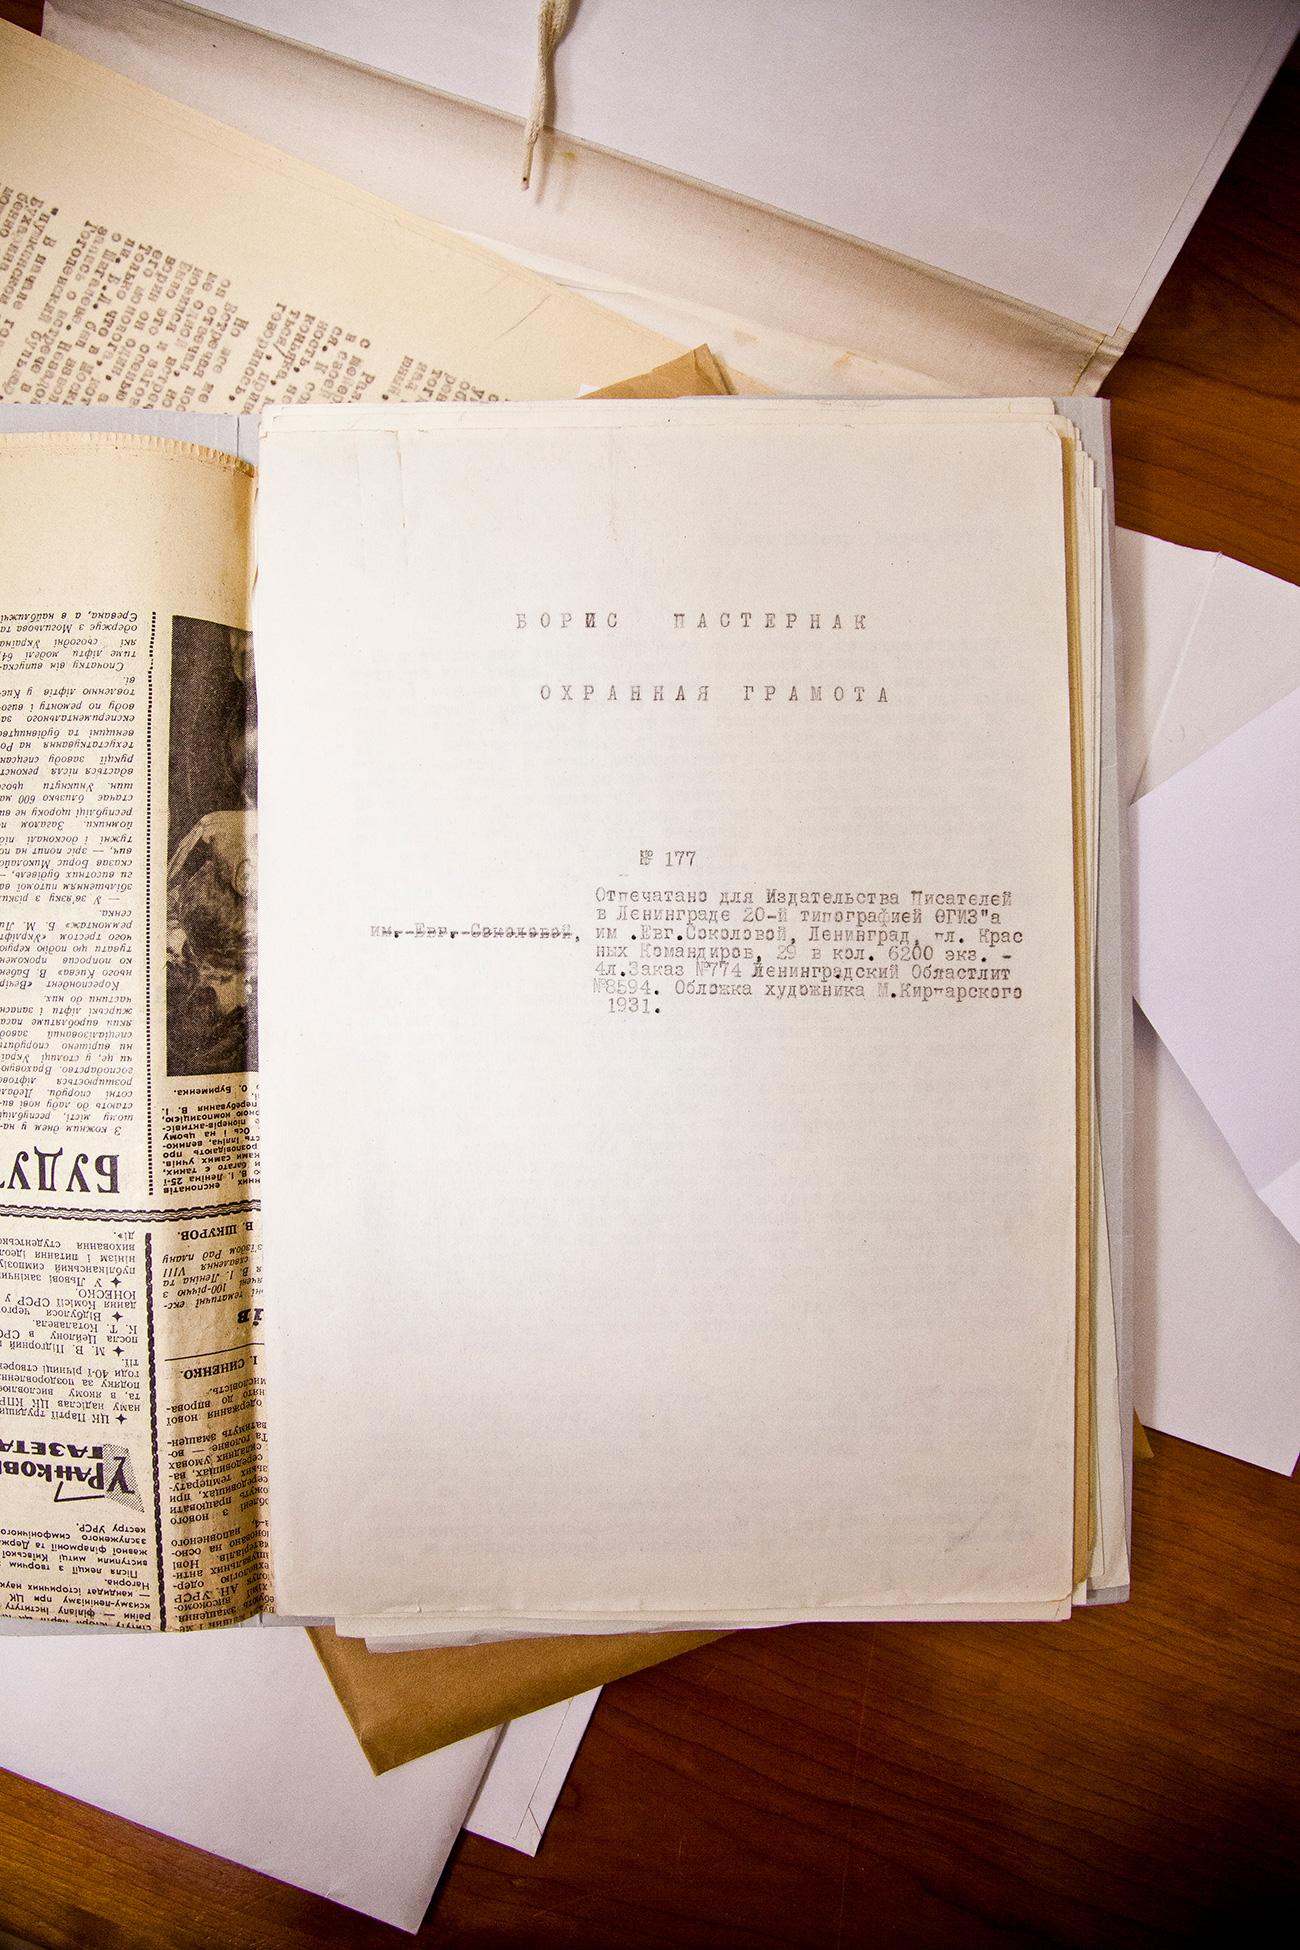 Le opere di Pasternak\n